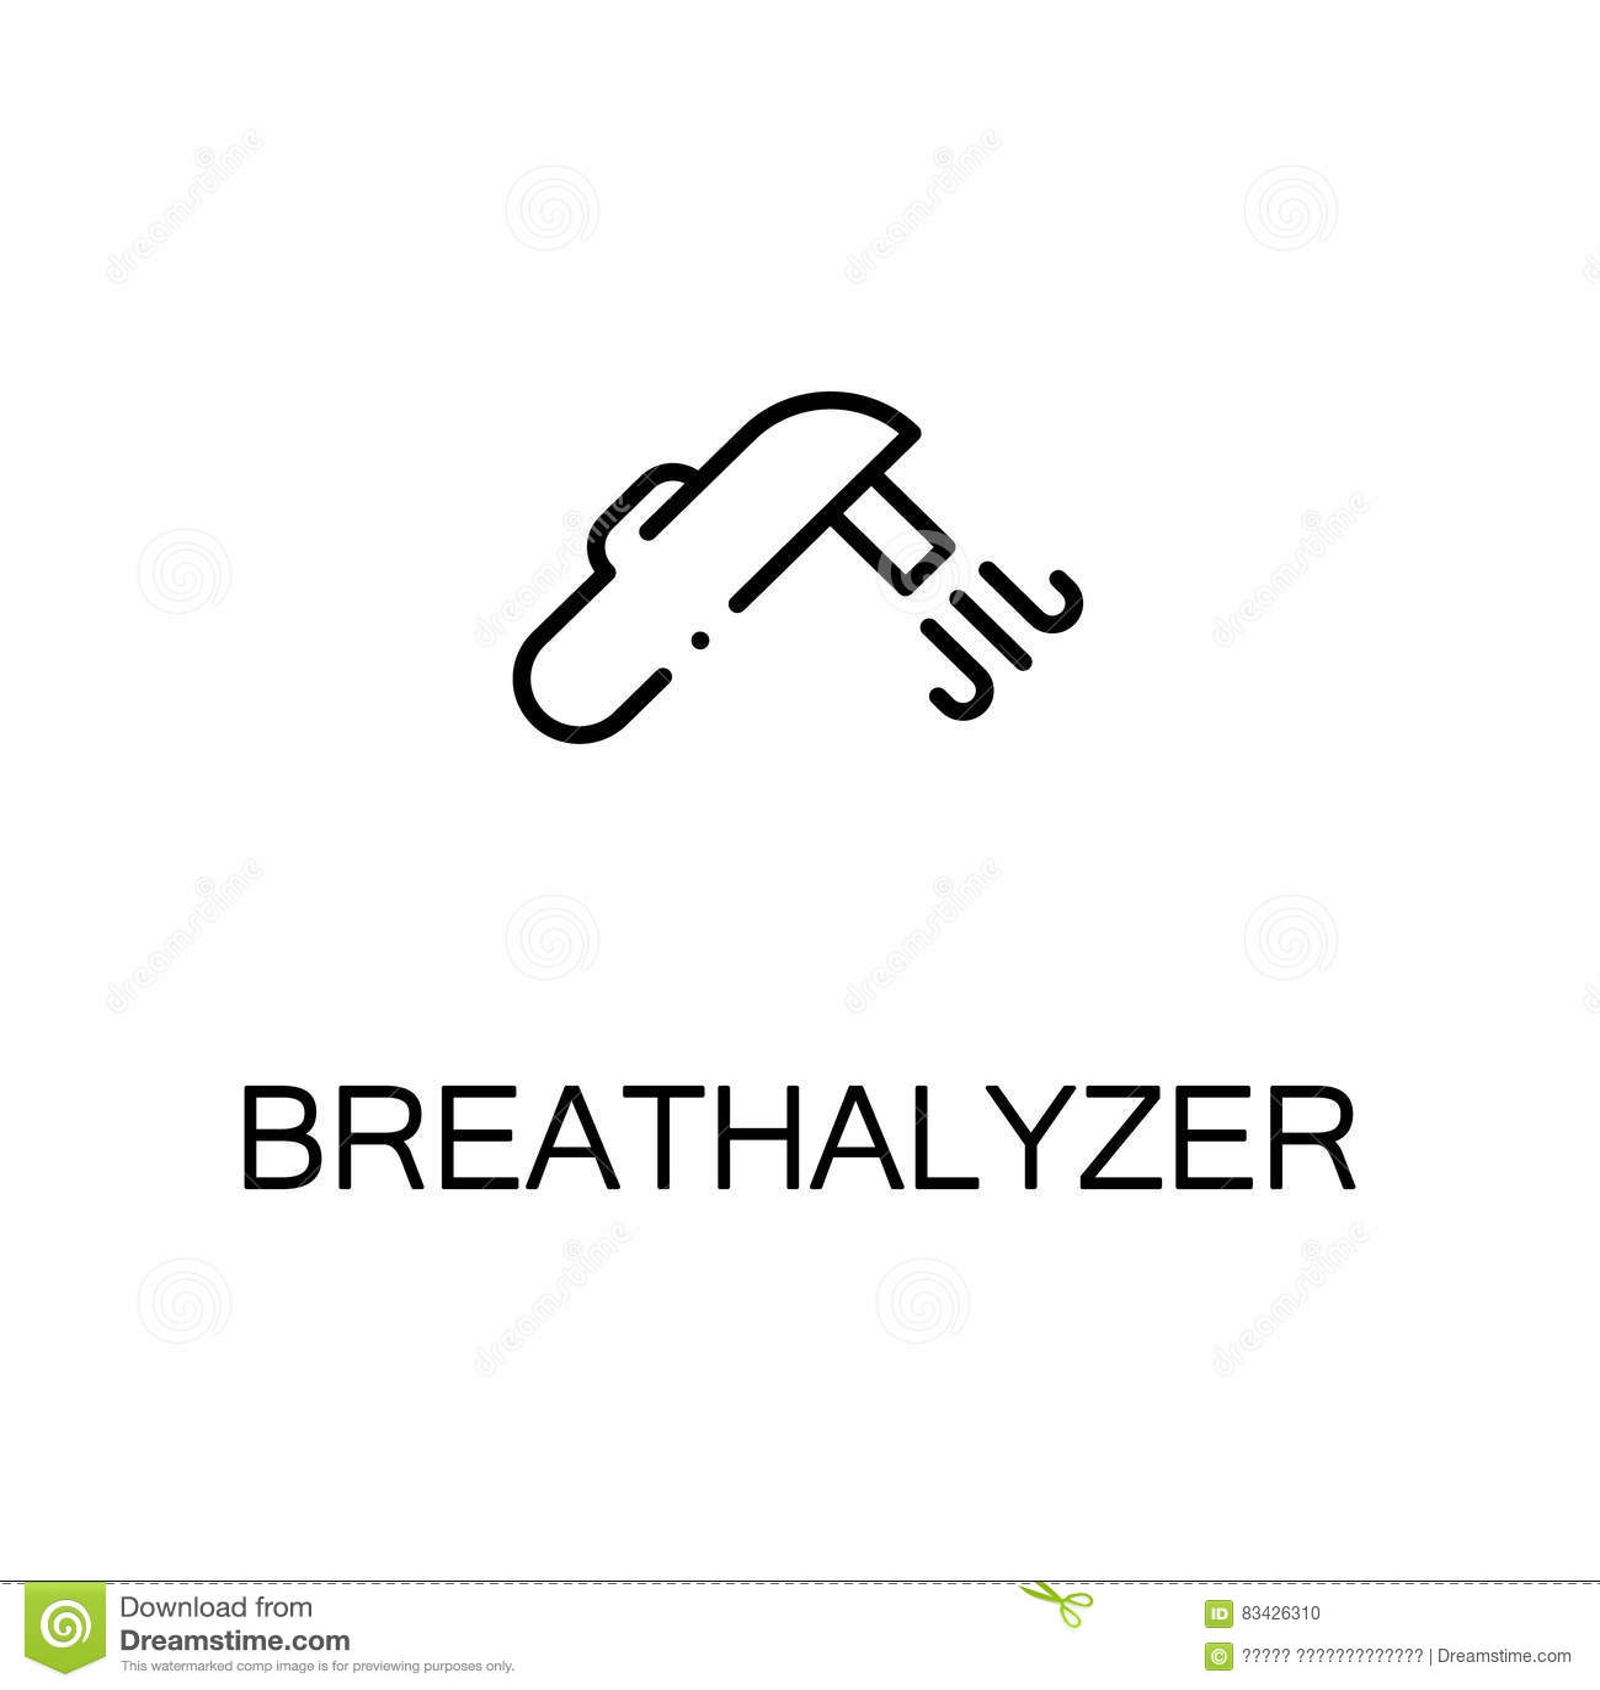 Breathalyzer Flat Icon Or Logo For Web Design Vector